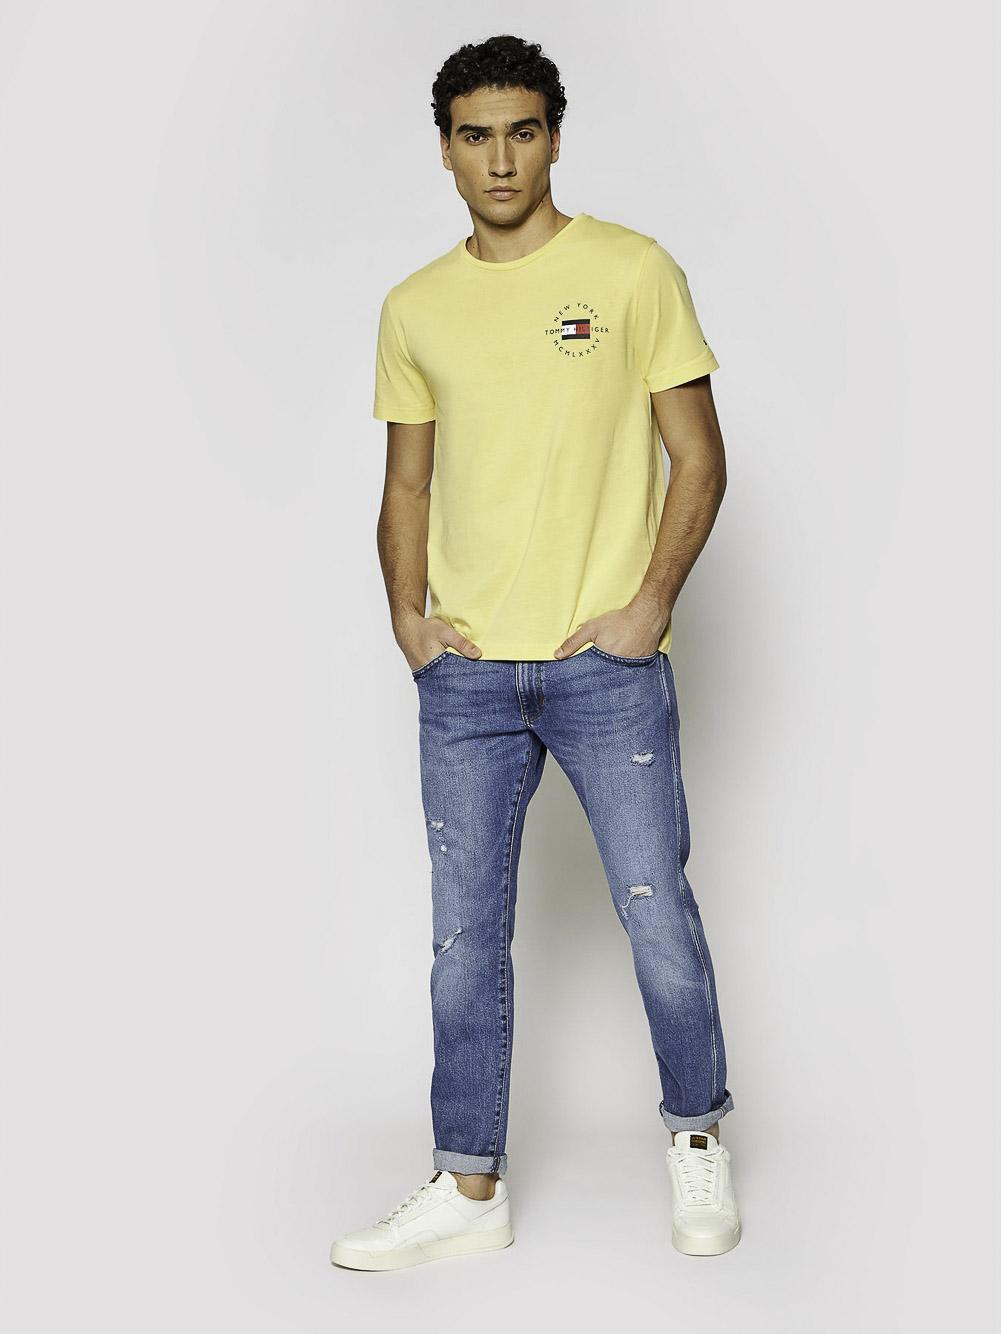 TOMMY HILFIGER Μπλούζα t-shirt MW0MW17680 ΚΙΤΡΙΝΟ